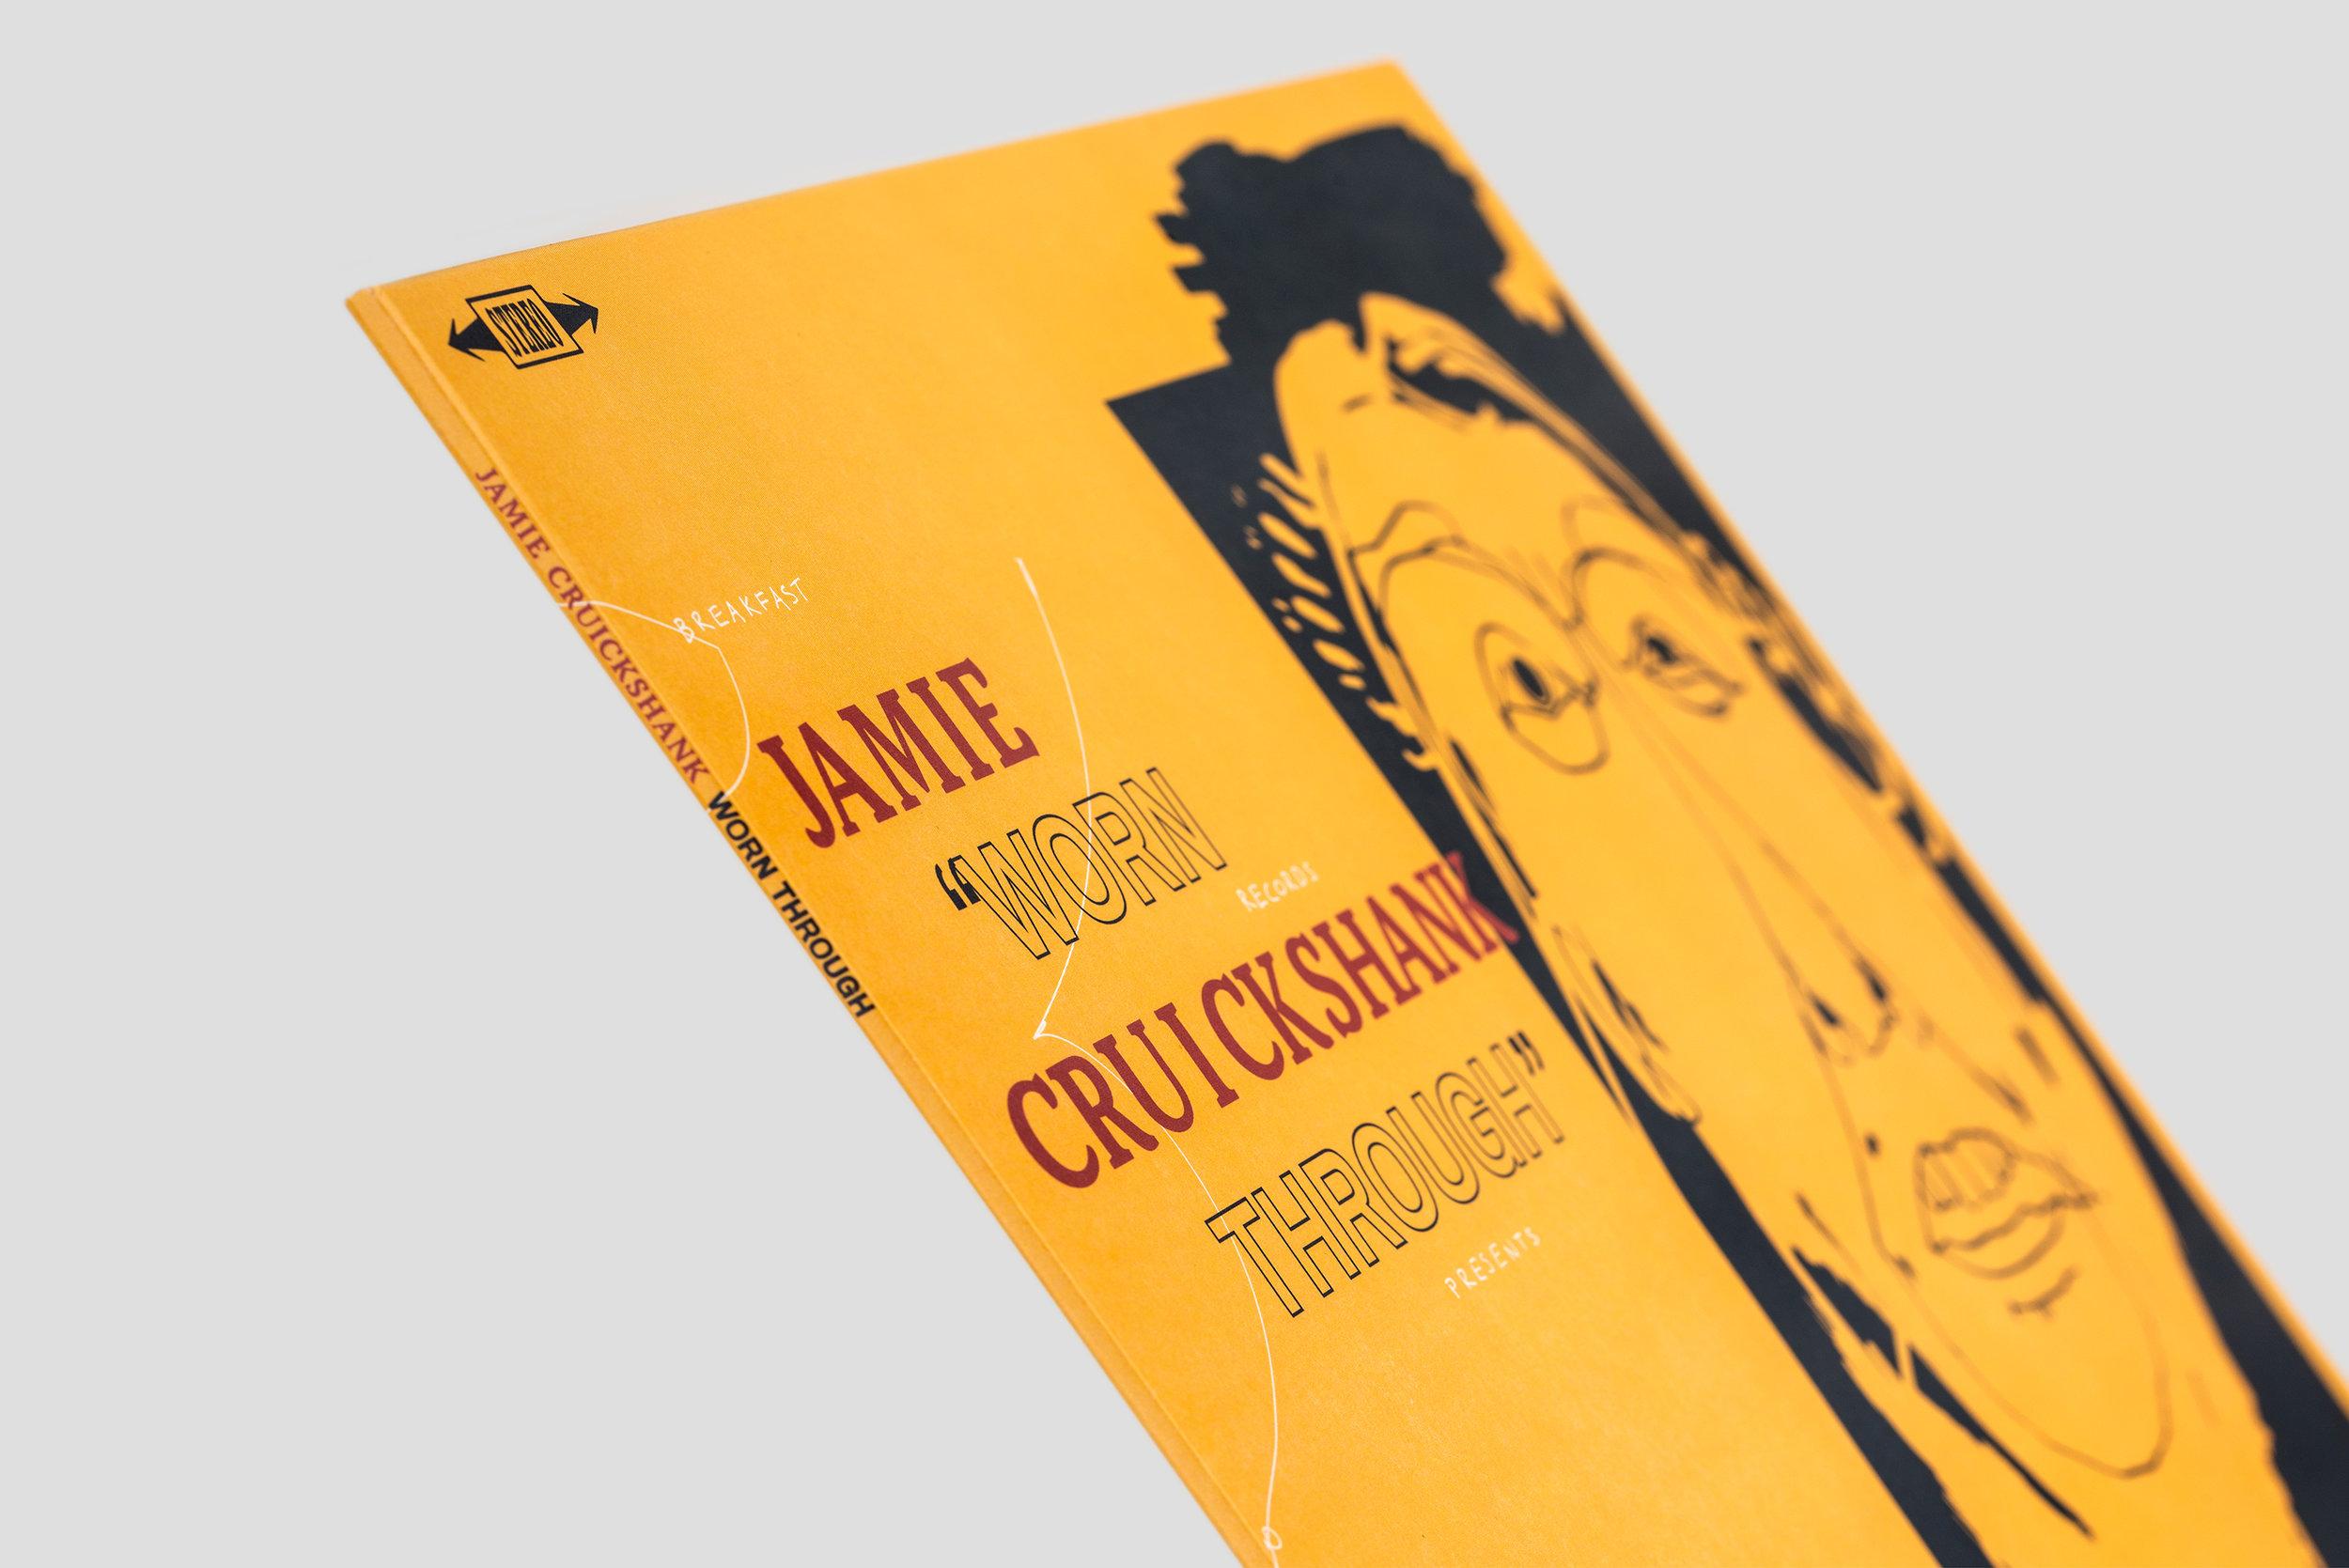 Jamie_Cruickshank_Tom_Sydenham_Design_2.jpg